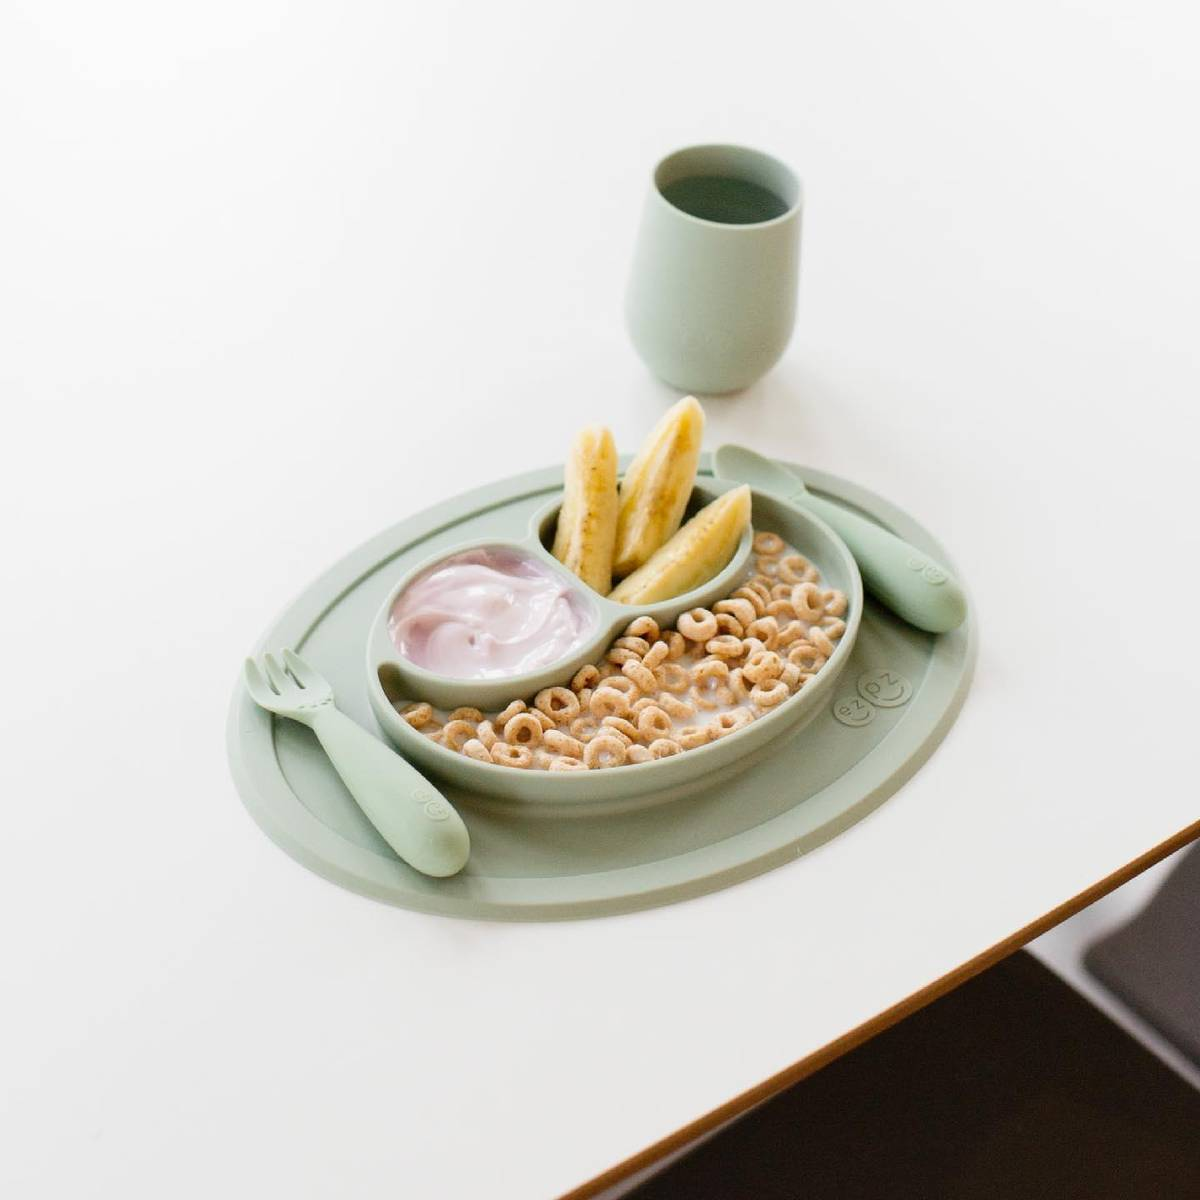 Ezpz - Alt-i-ett-spisebrikke i Silikon - Sage